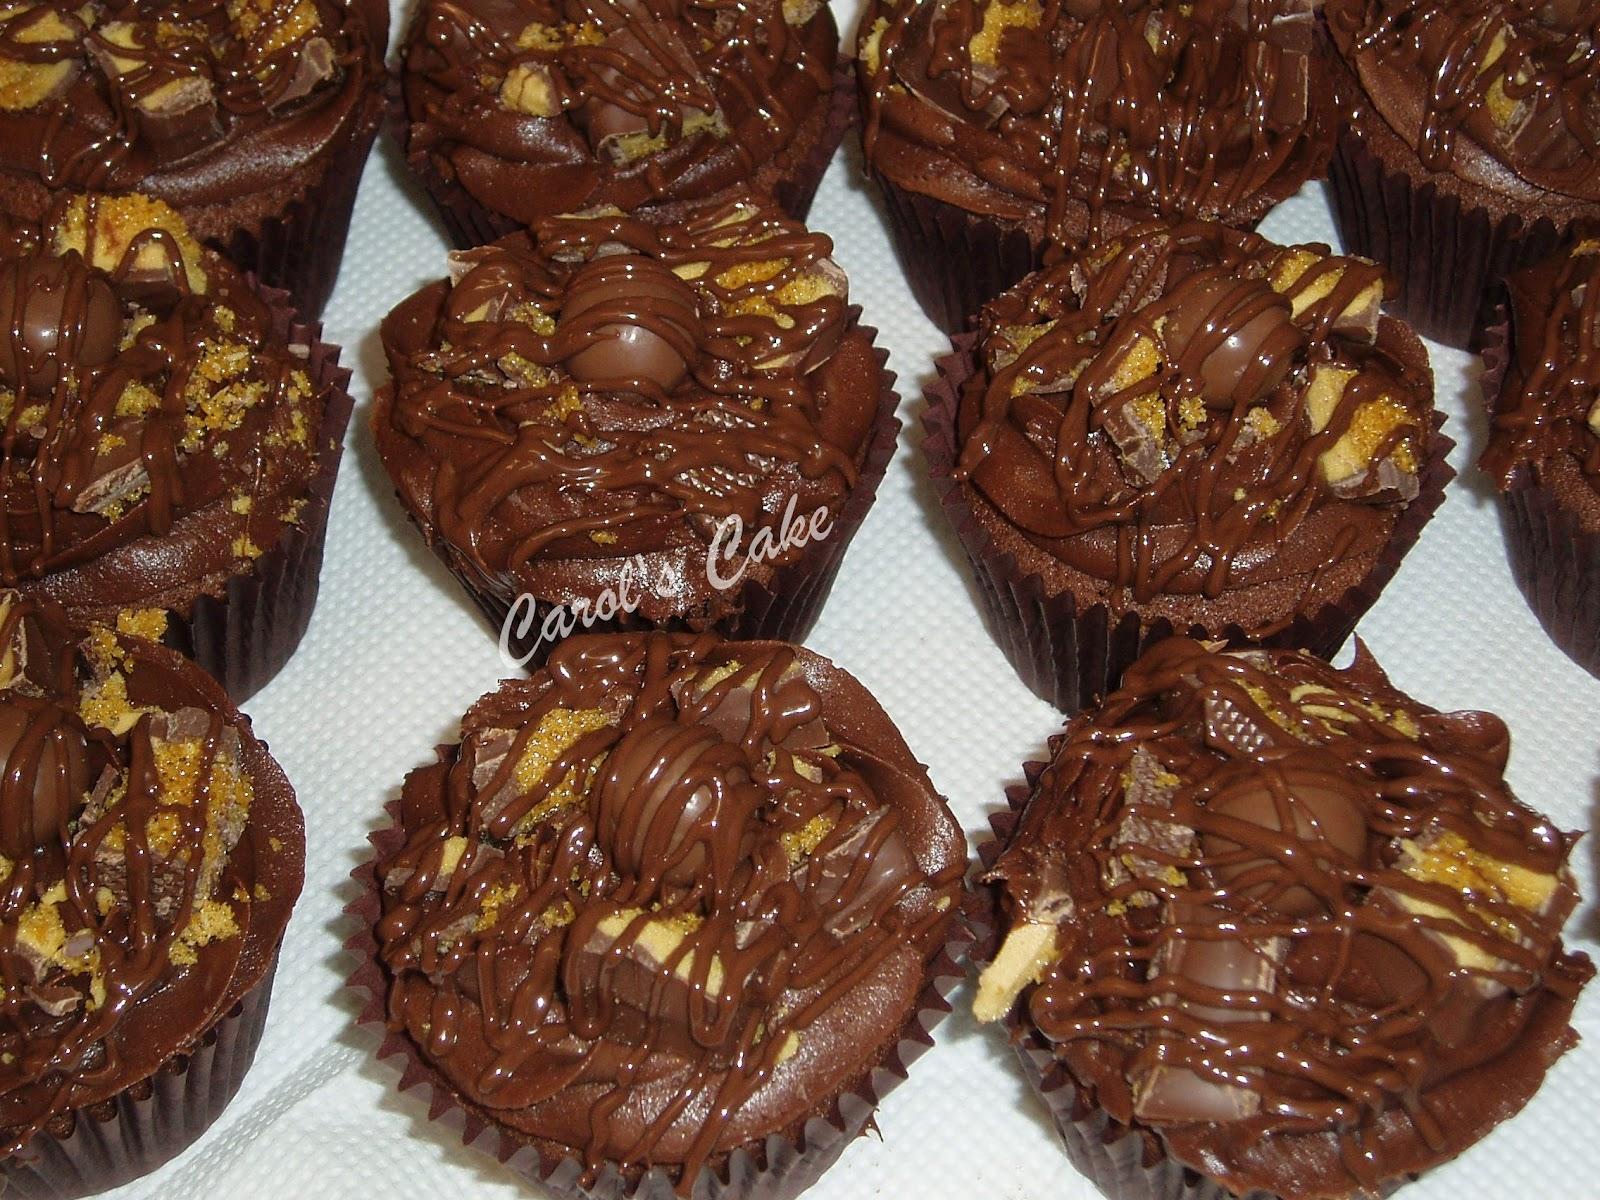 cupcakes - Carols Cake